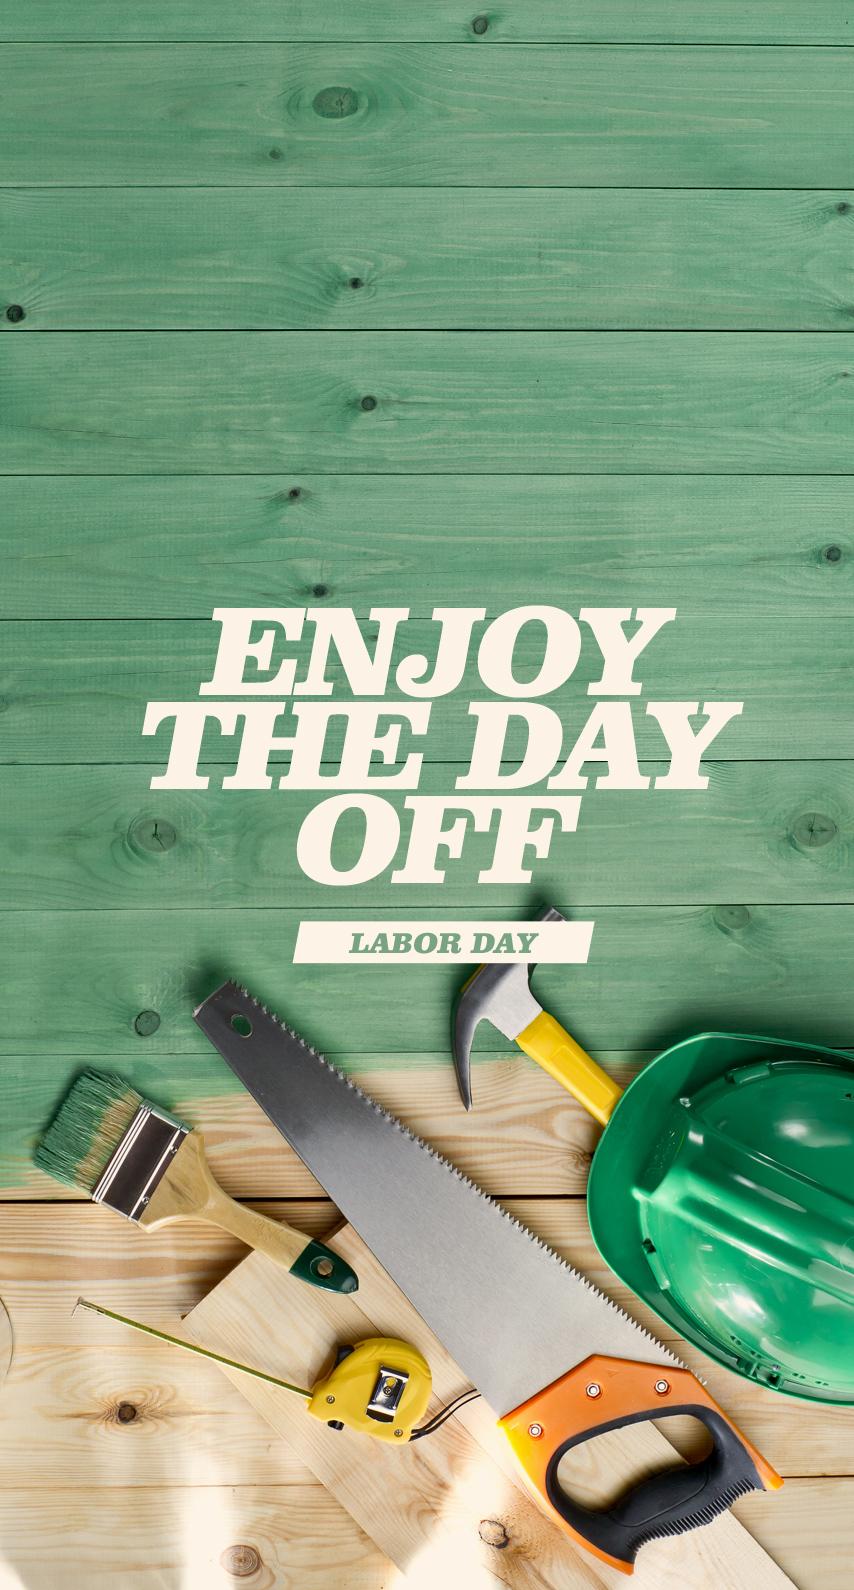 wood, labor day